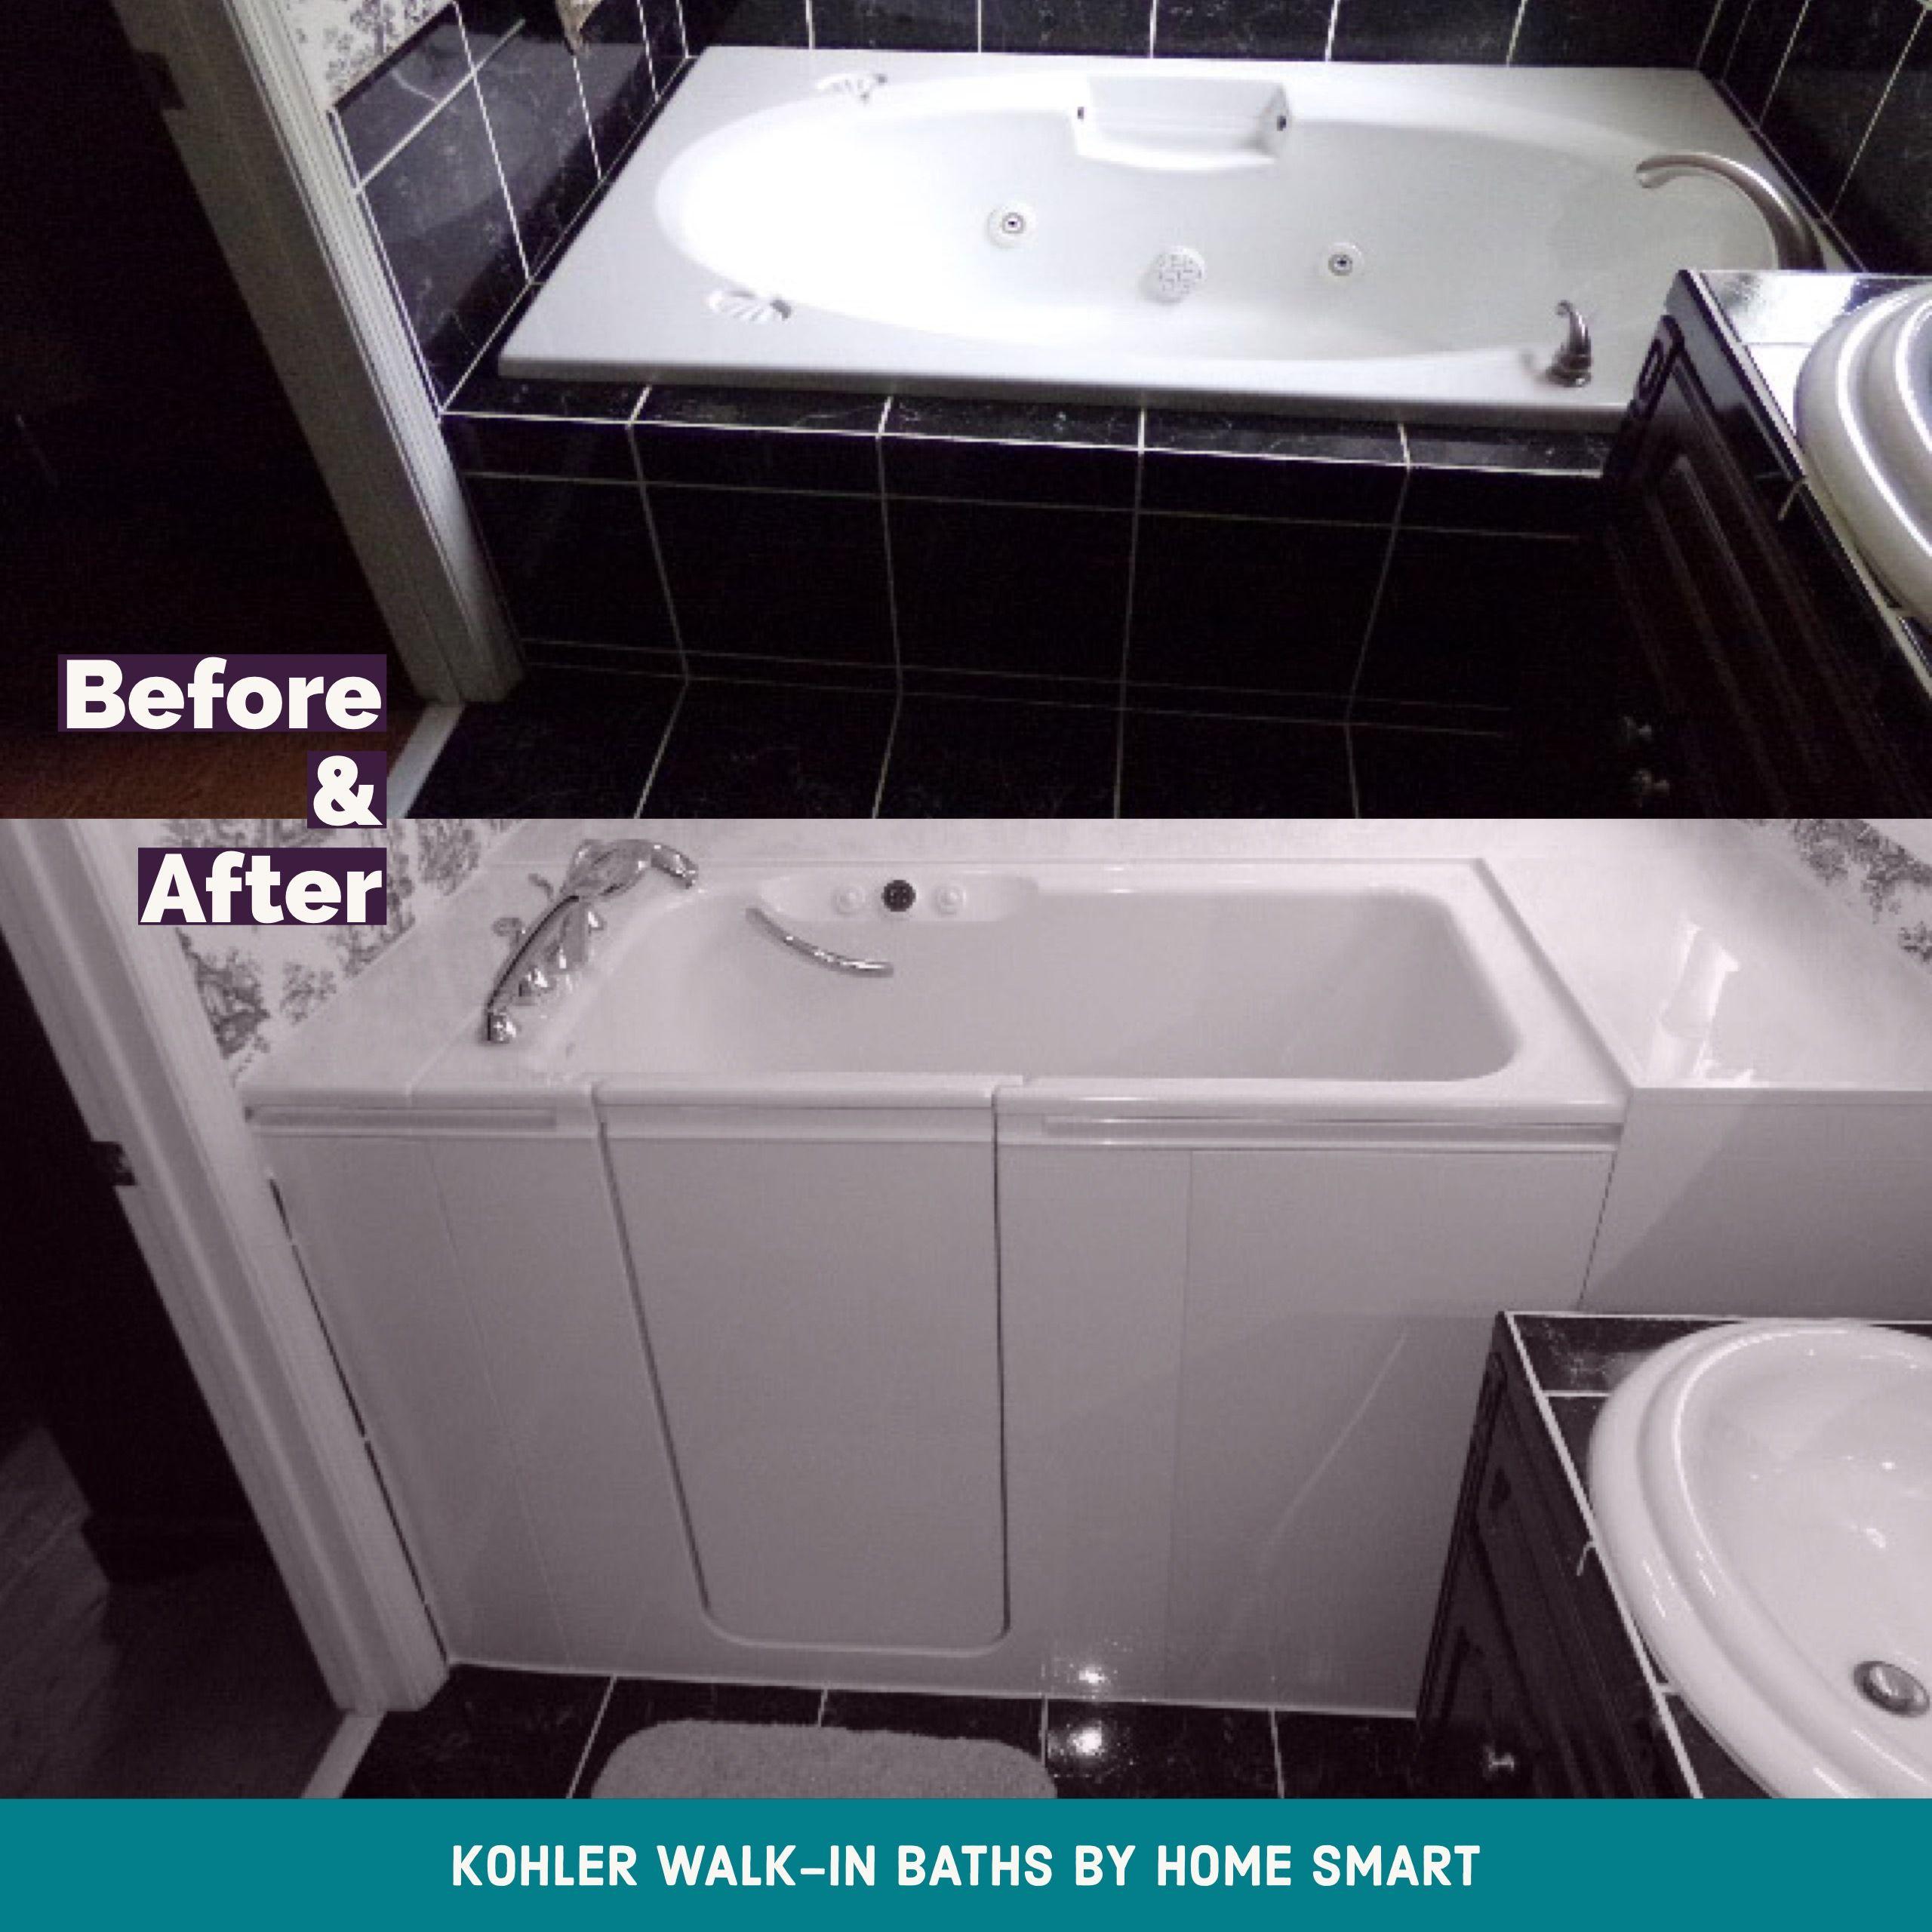 Dangerous Bathtubs Avoid Bathroom Falls Take A Small Safe Step